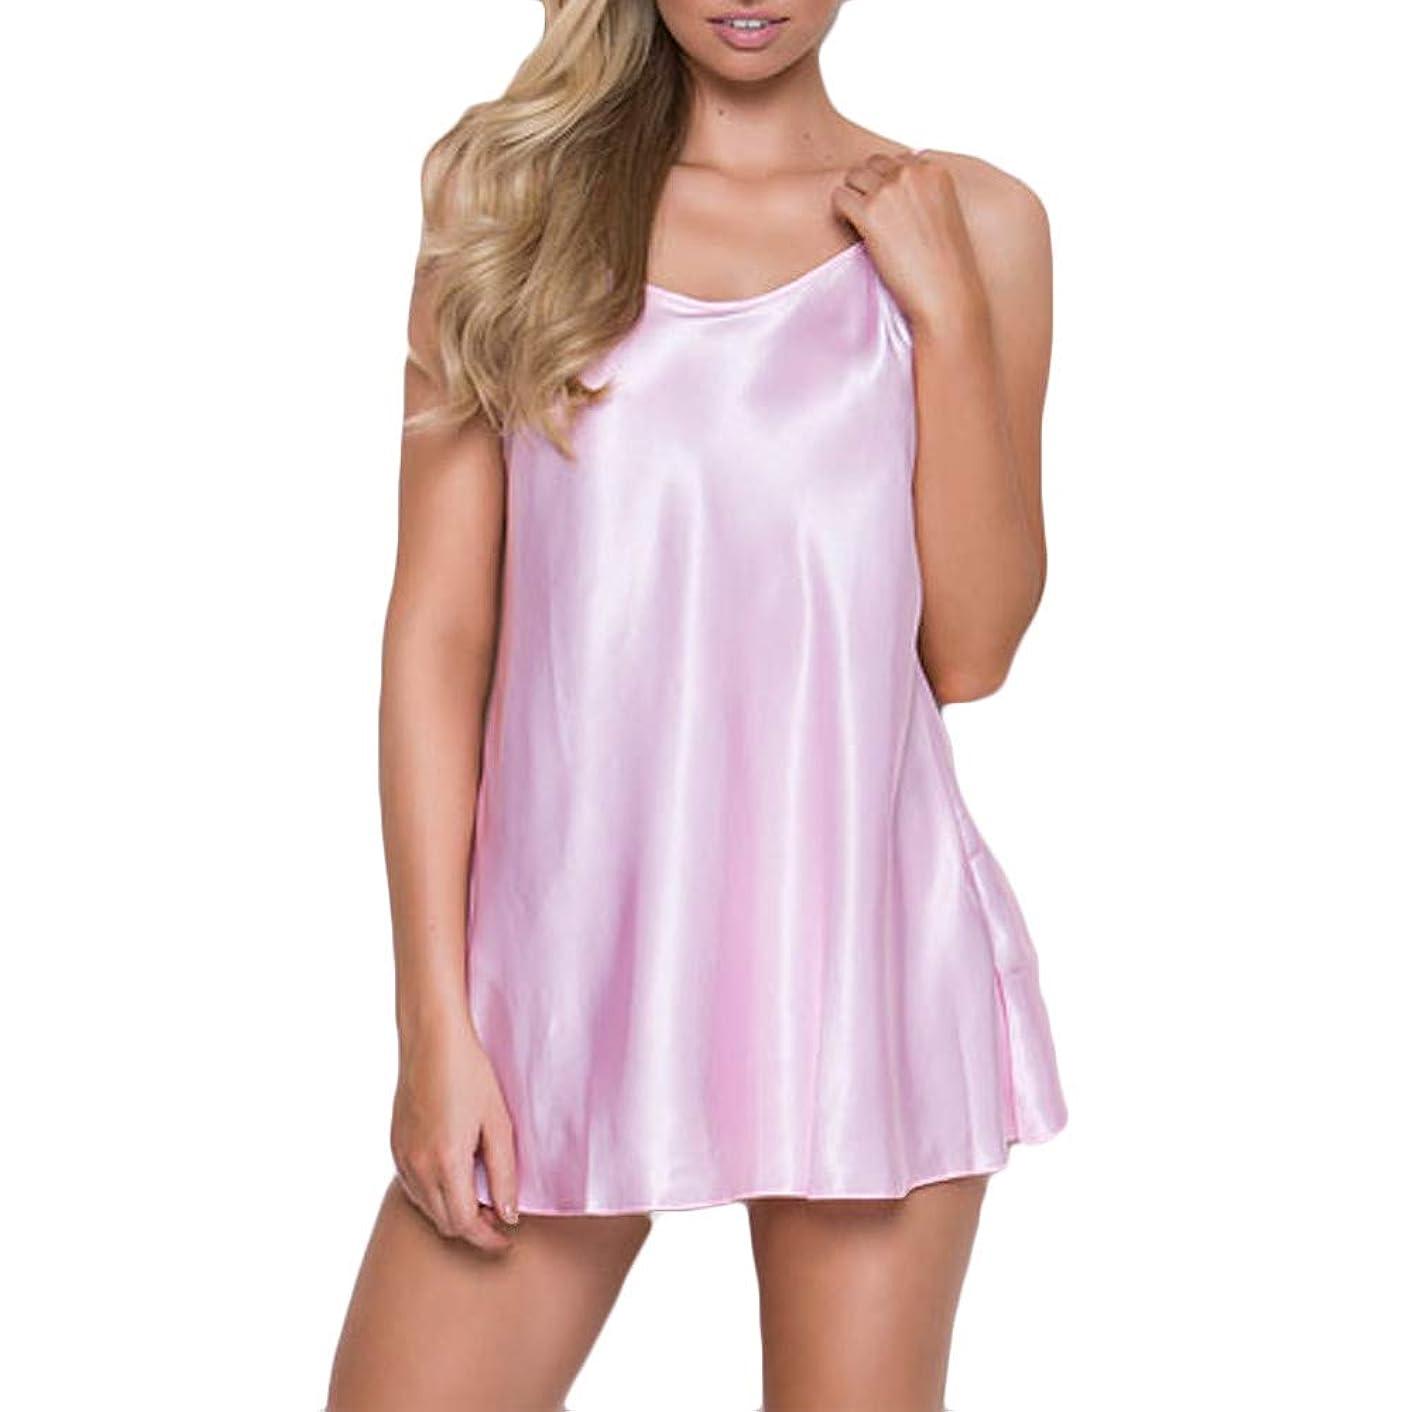 Redbrowm Women'S Lingerie,2018 New Satin Strap Sexy Underwear Casual Pajamas